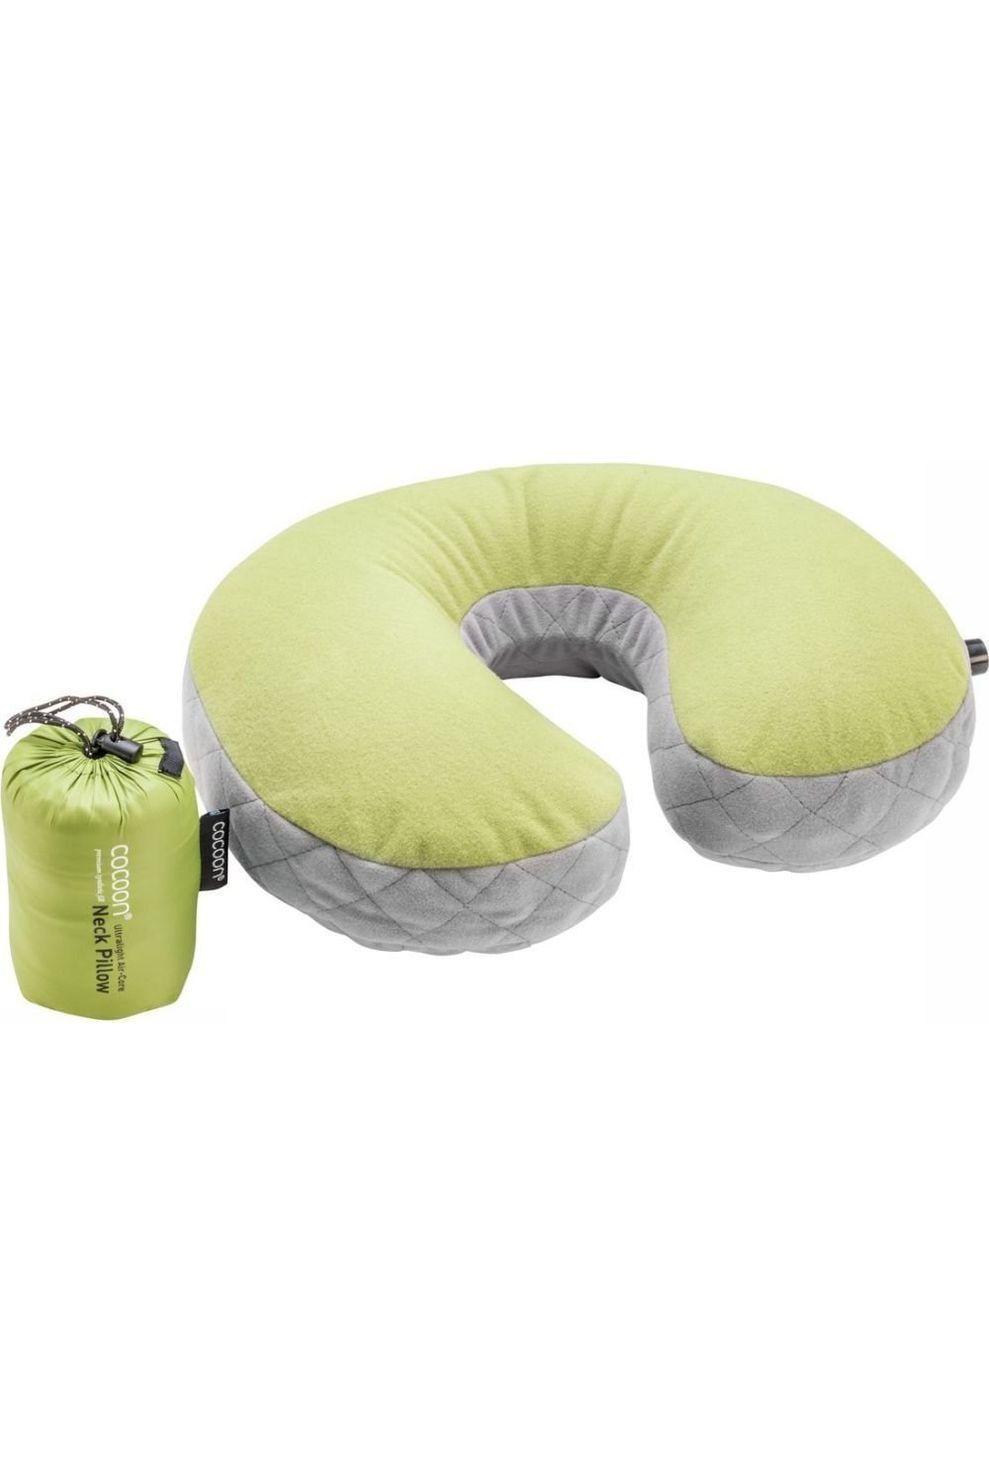 Cocoon Kussen Neck Pillow Ultralight - Groen/Grijs